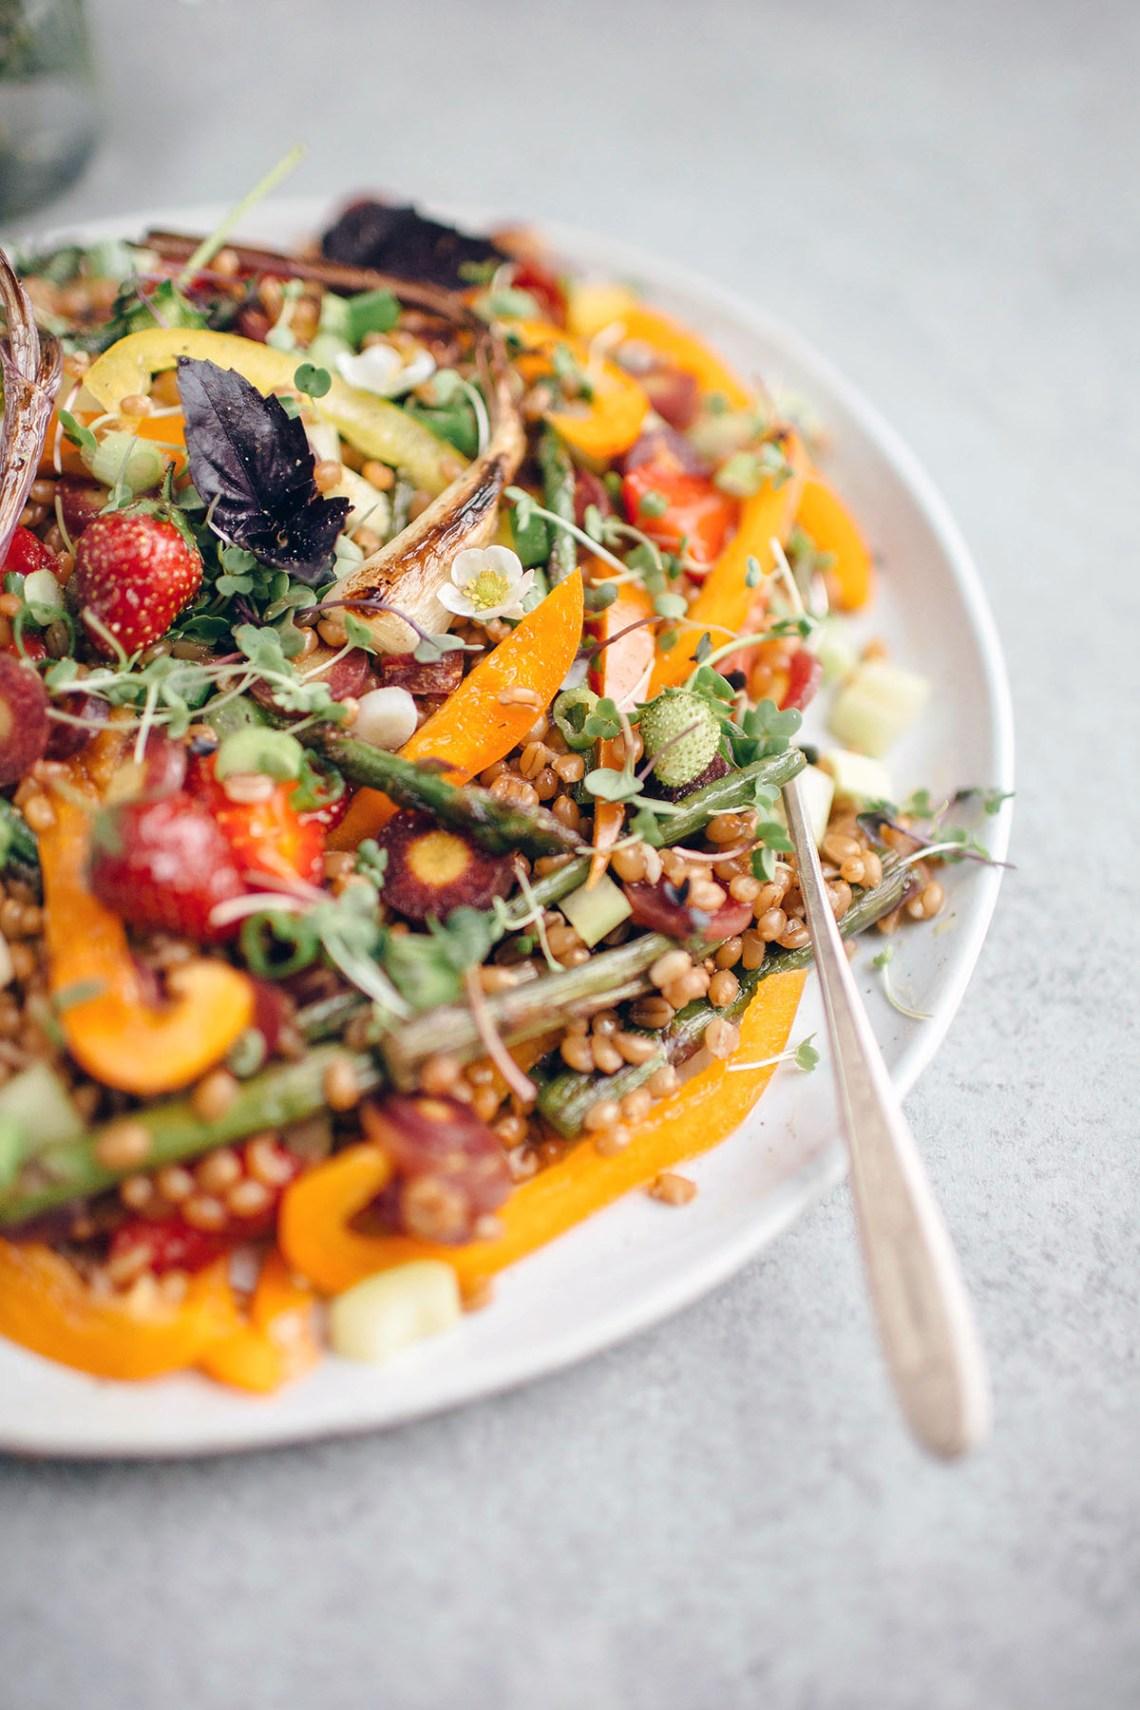 Vegetarian Spring Wheat Berry Salad recipe below: